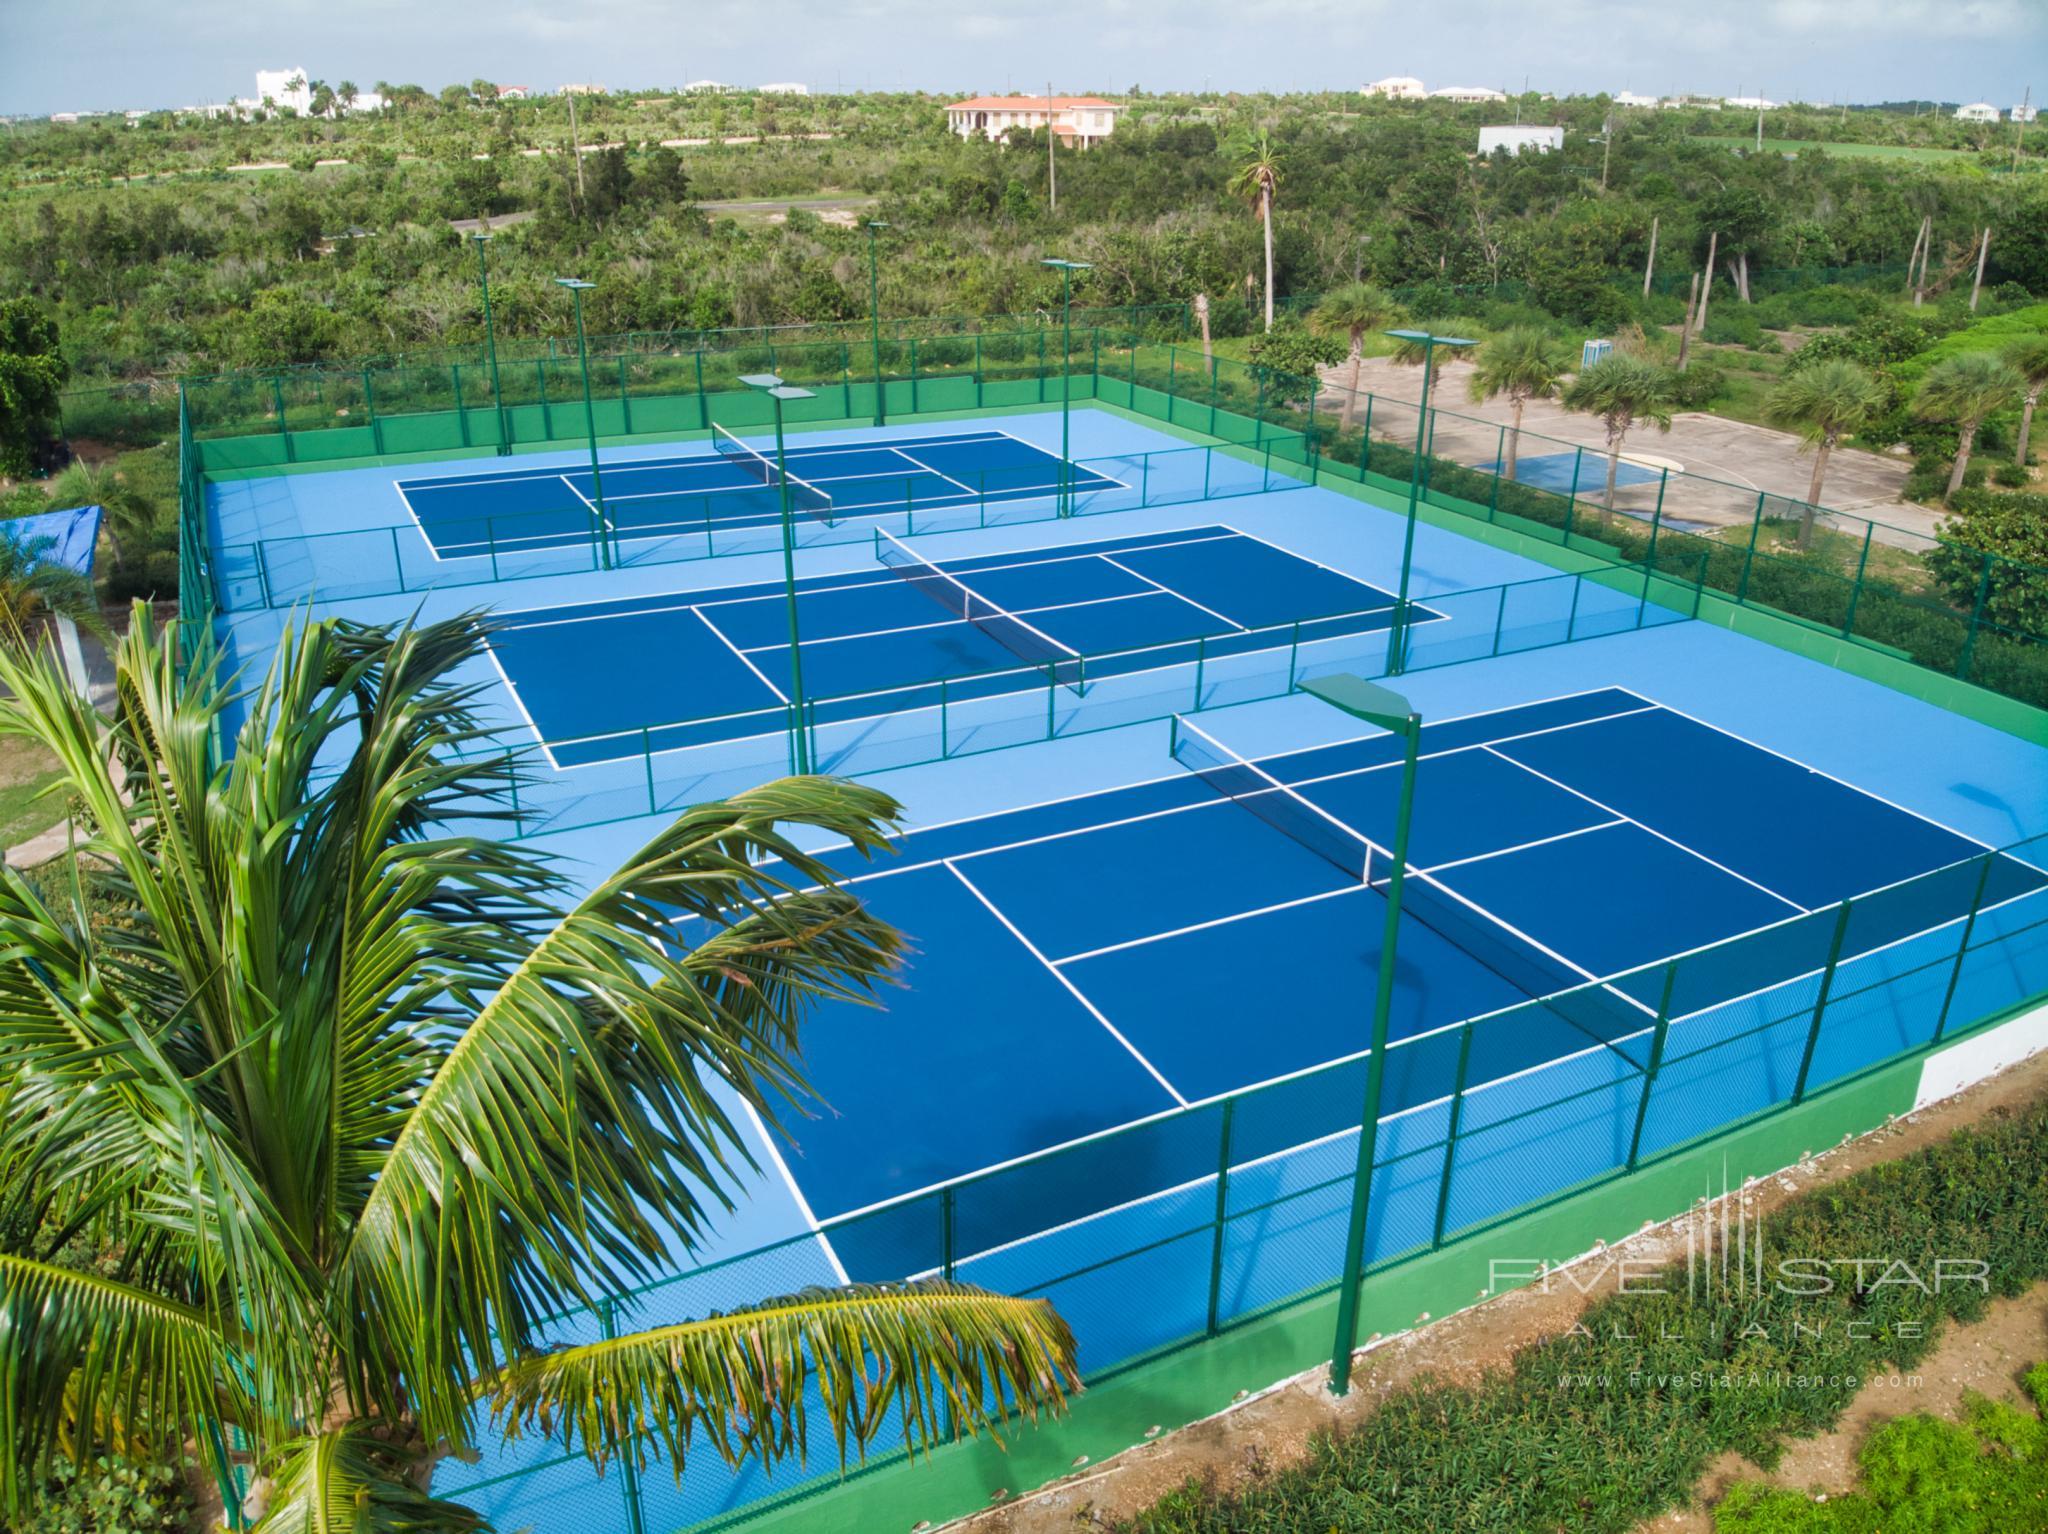 Tennis at Aurora Anguilla